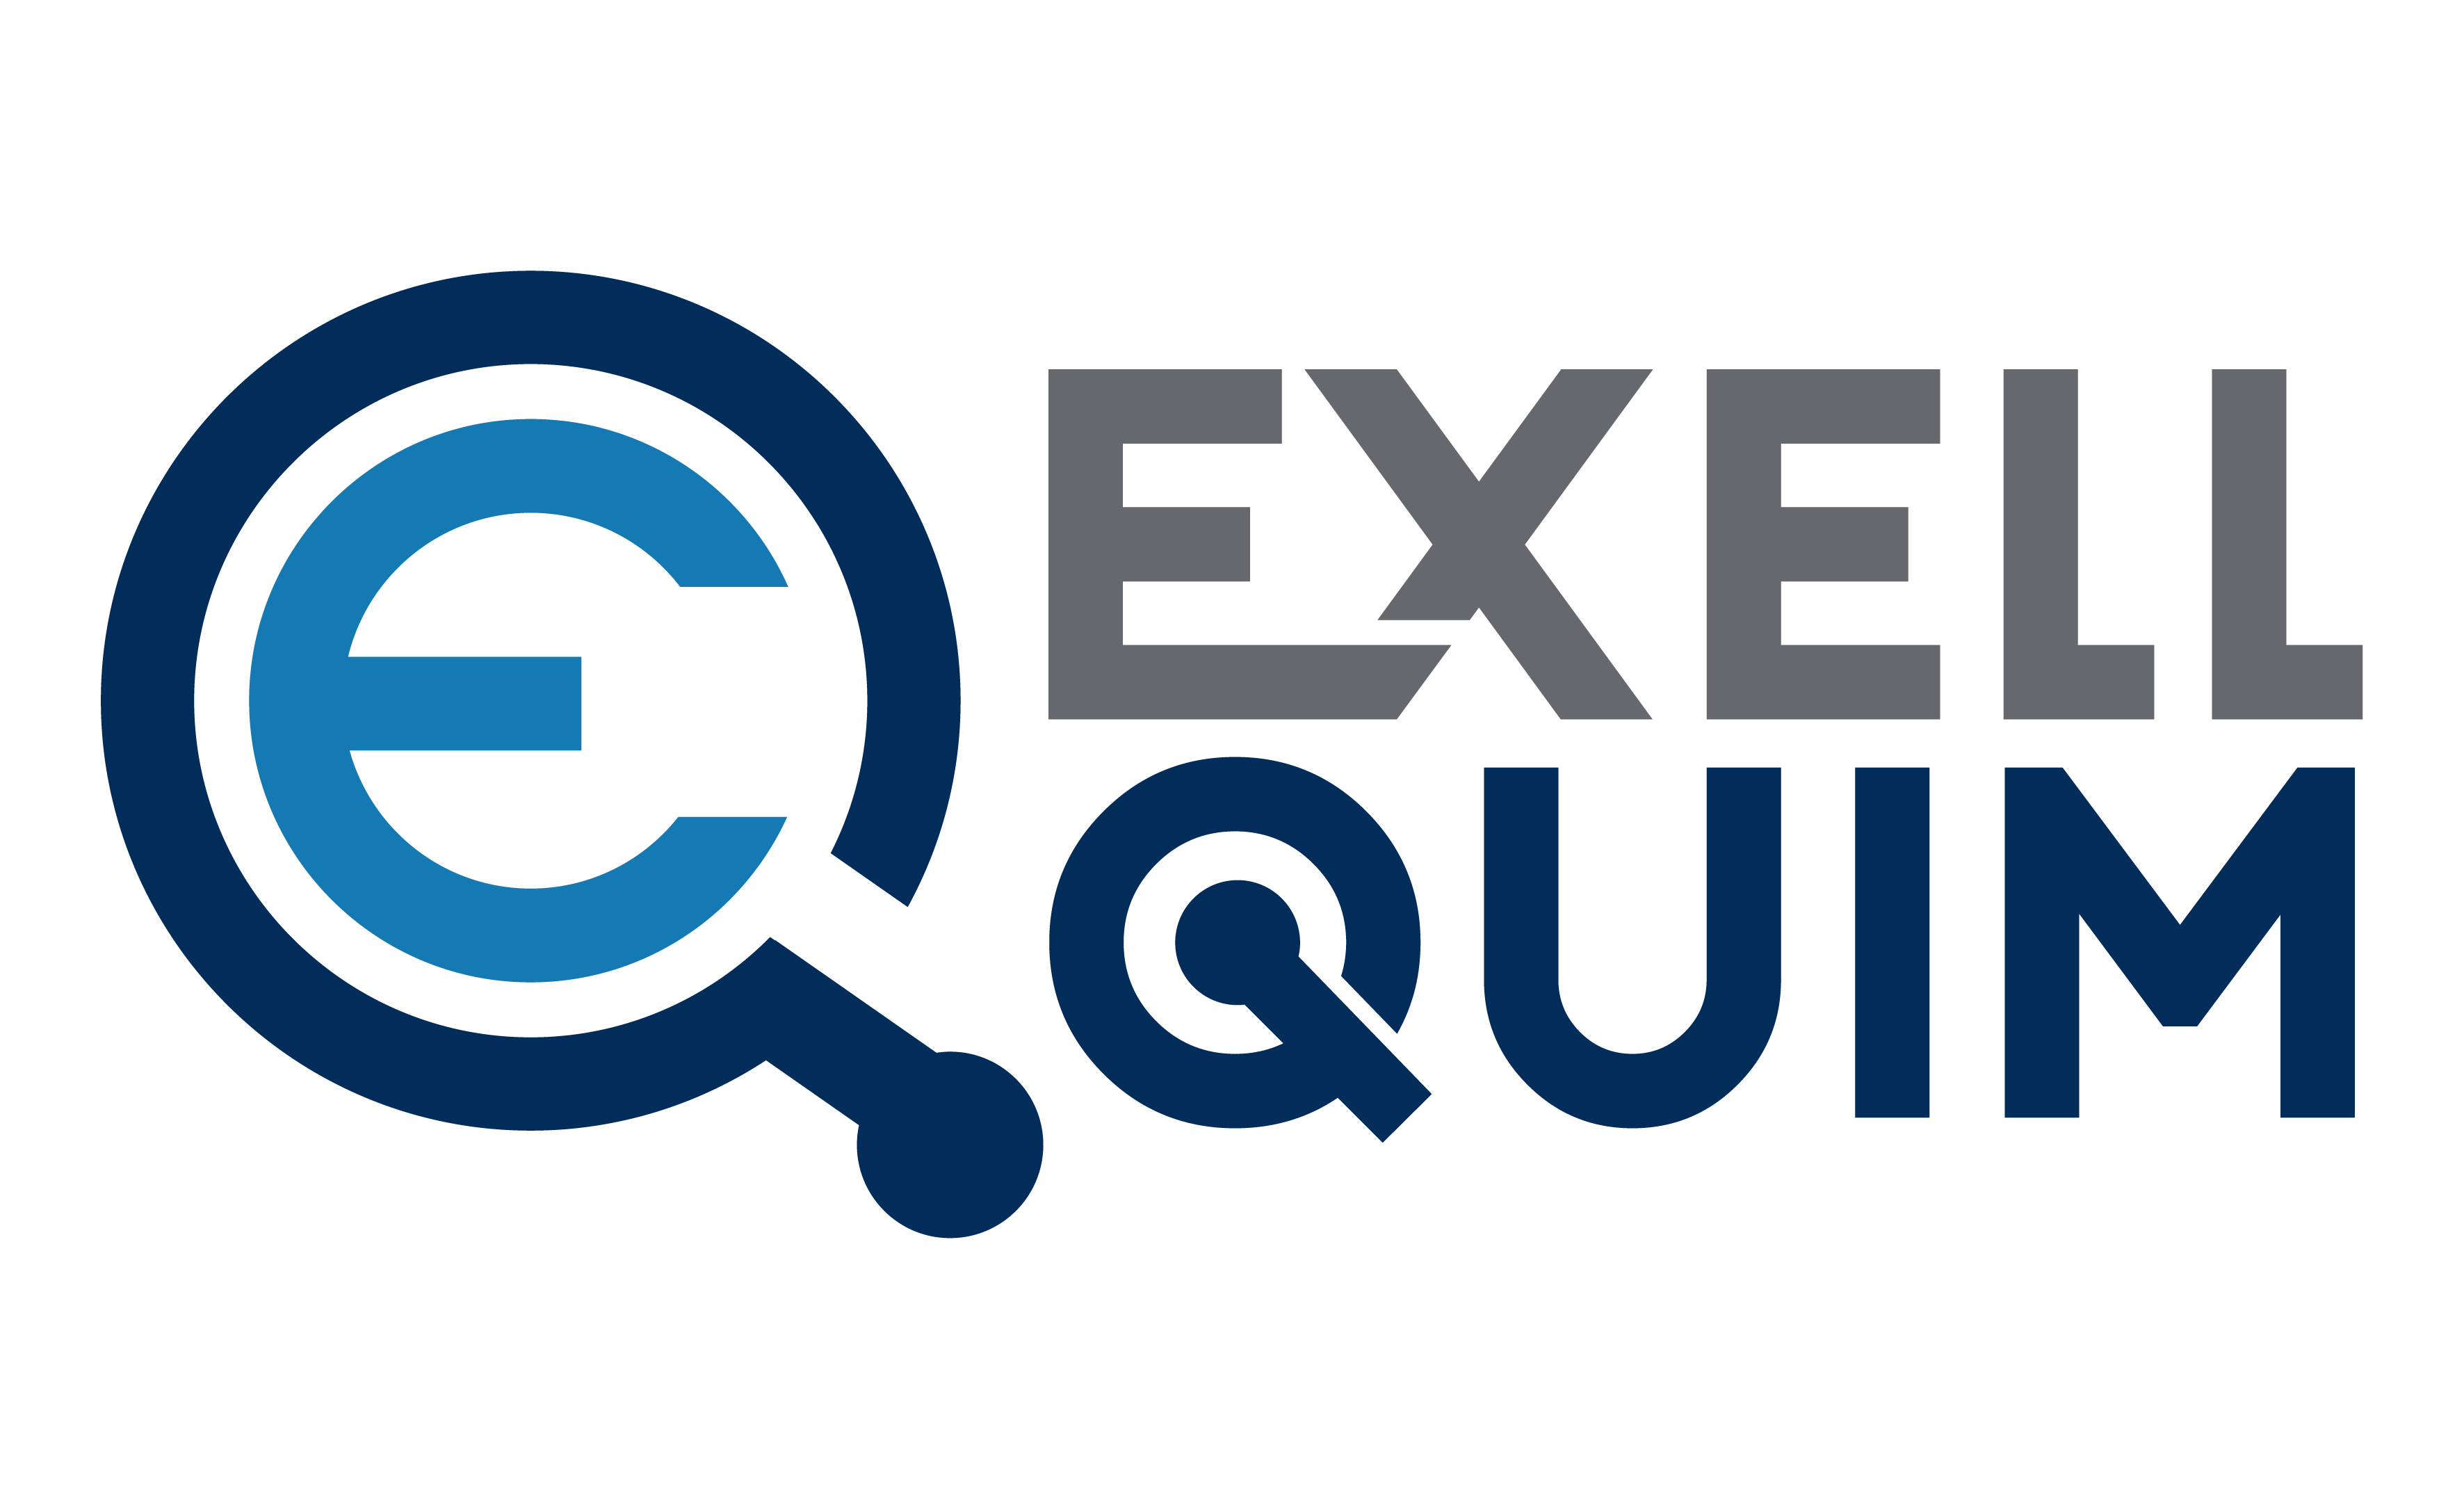 Exellquim